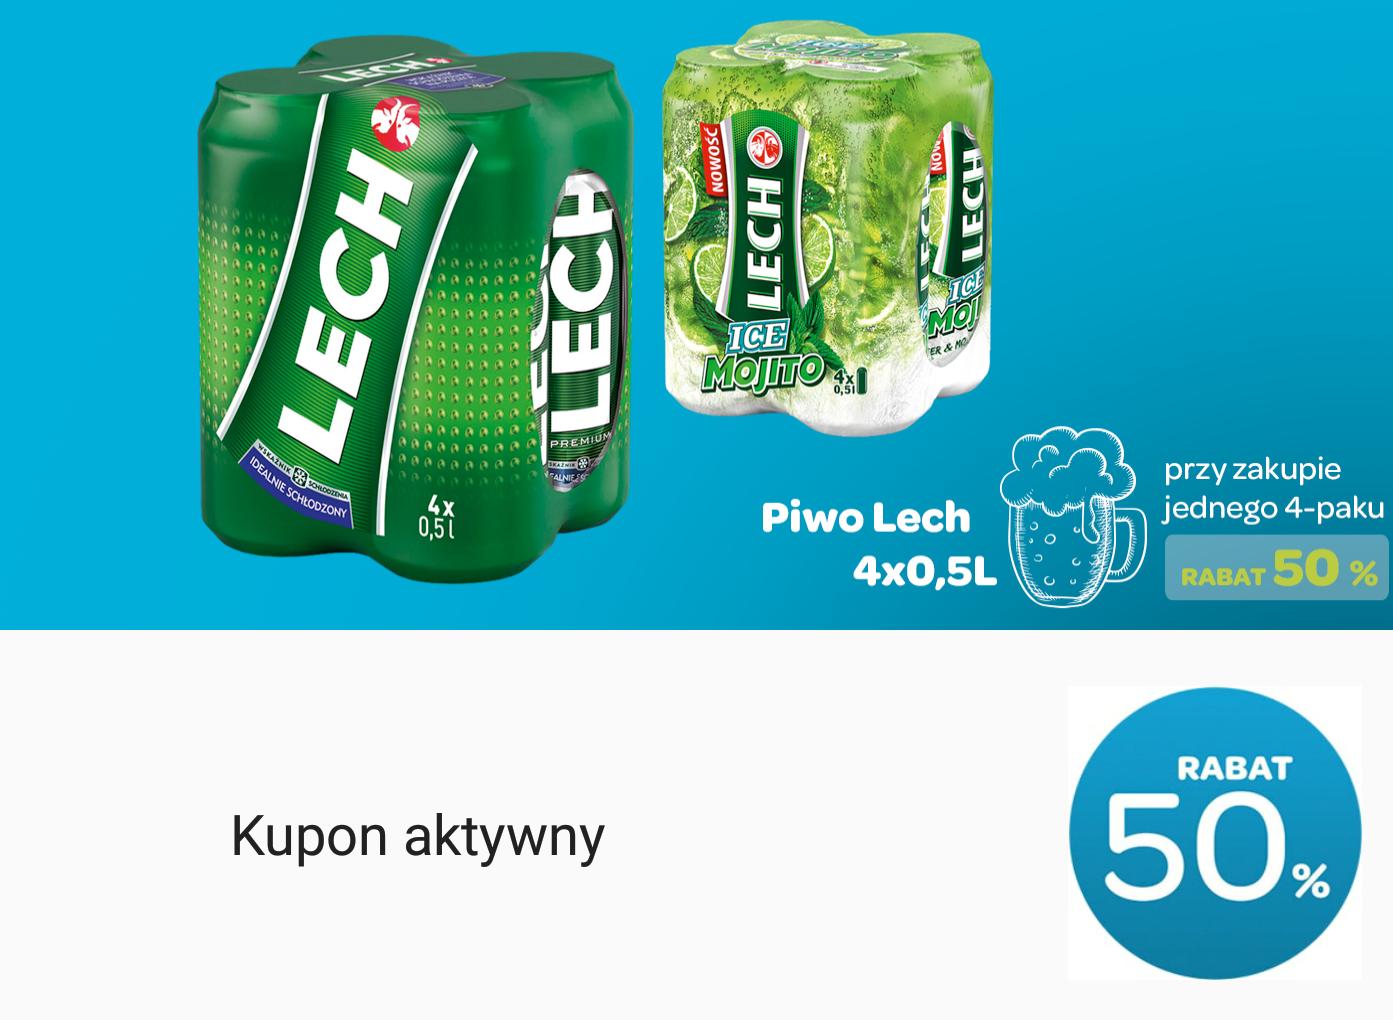 4-pak Lecha Premium za 5,6zł (Carrefour)